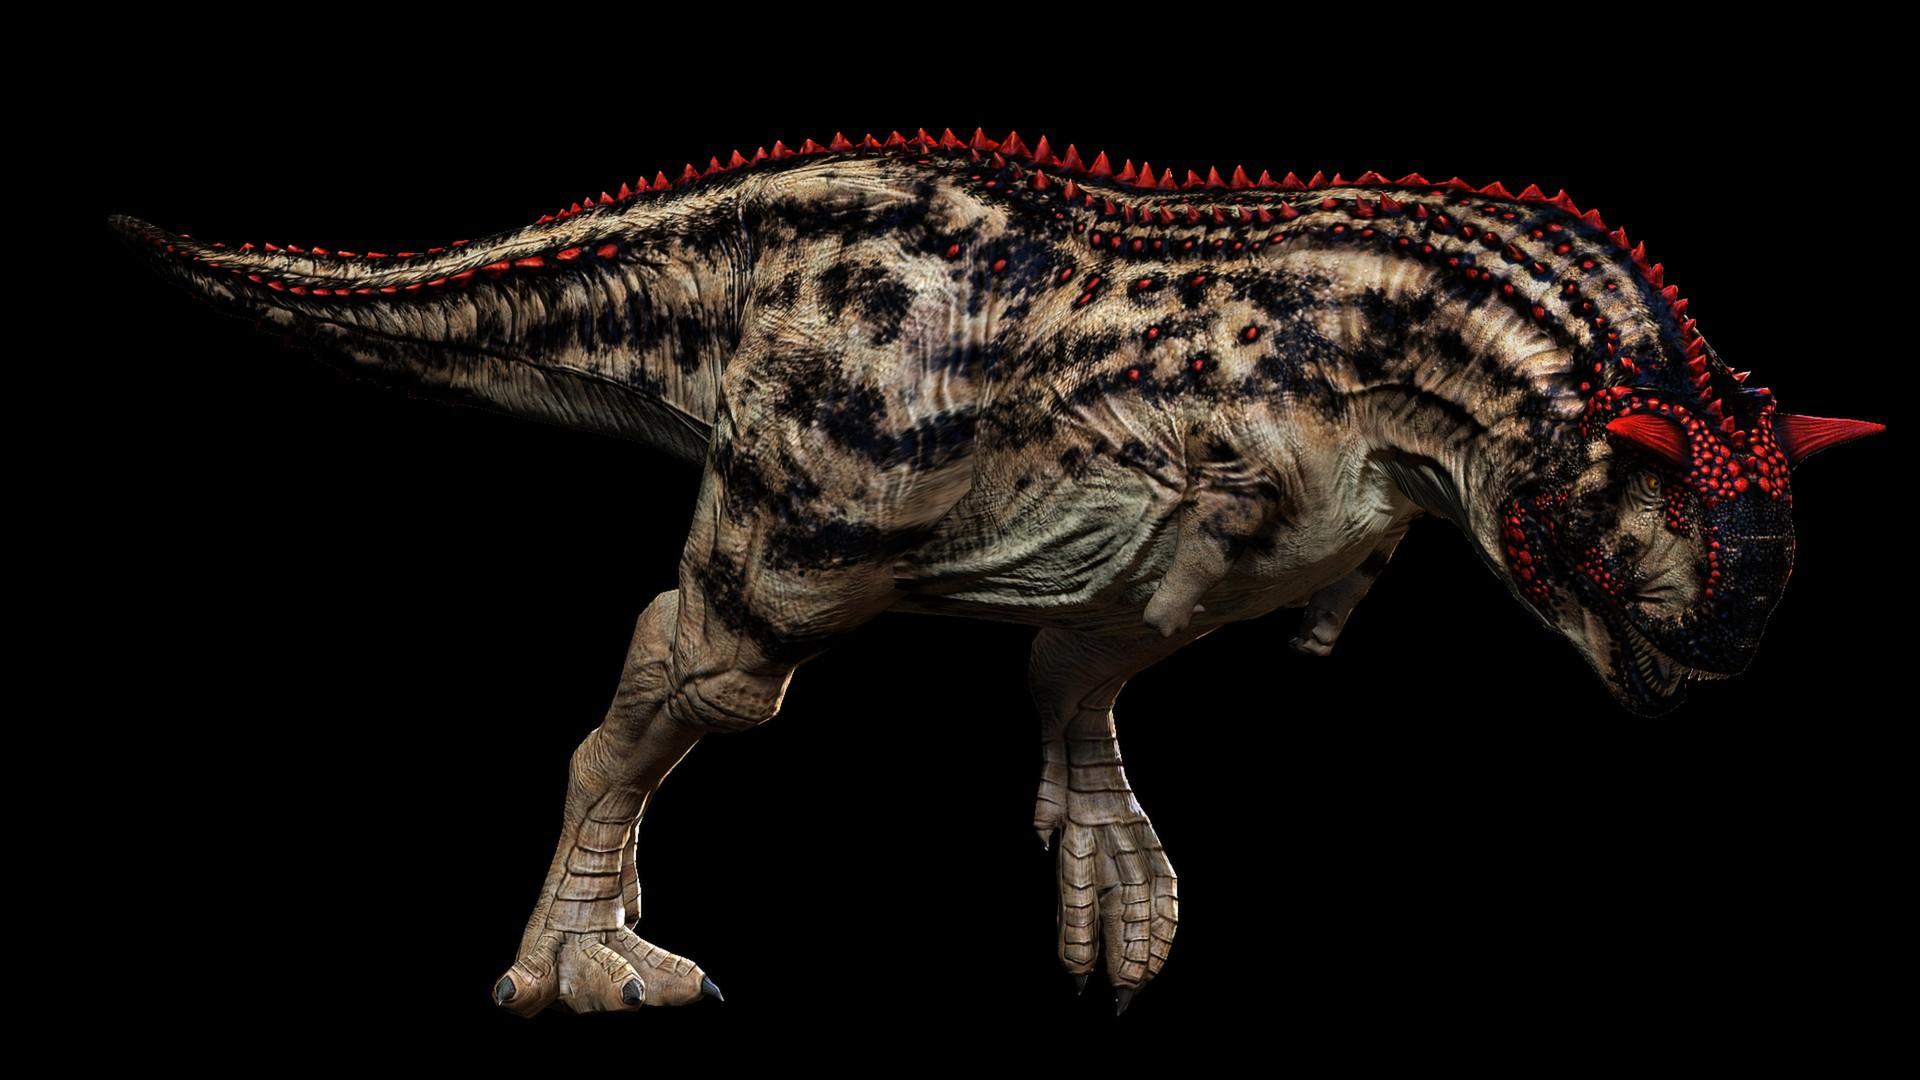 PRIMAL CARNAGE fantasy dinosaur i wallpaper 1920x1080 169027 1920x1080